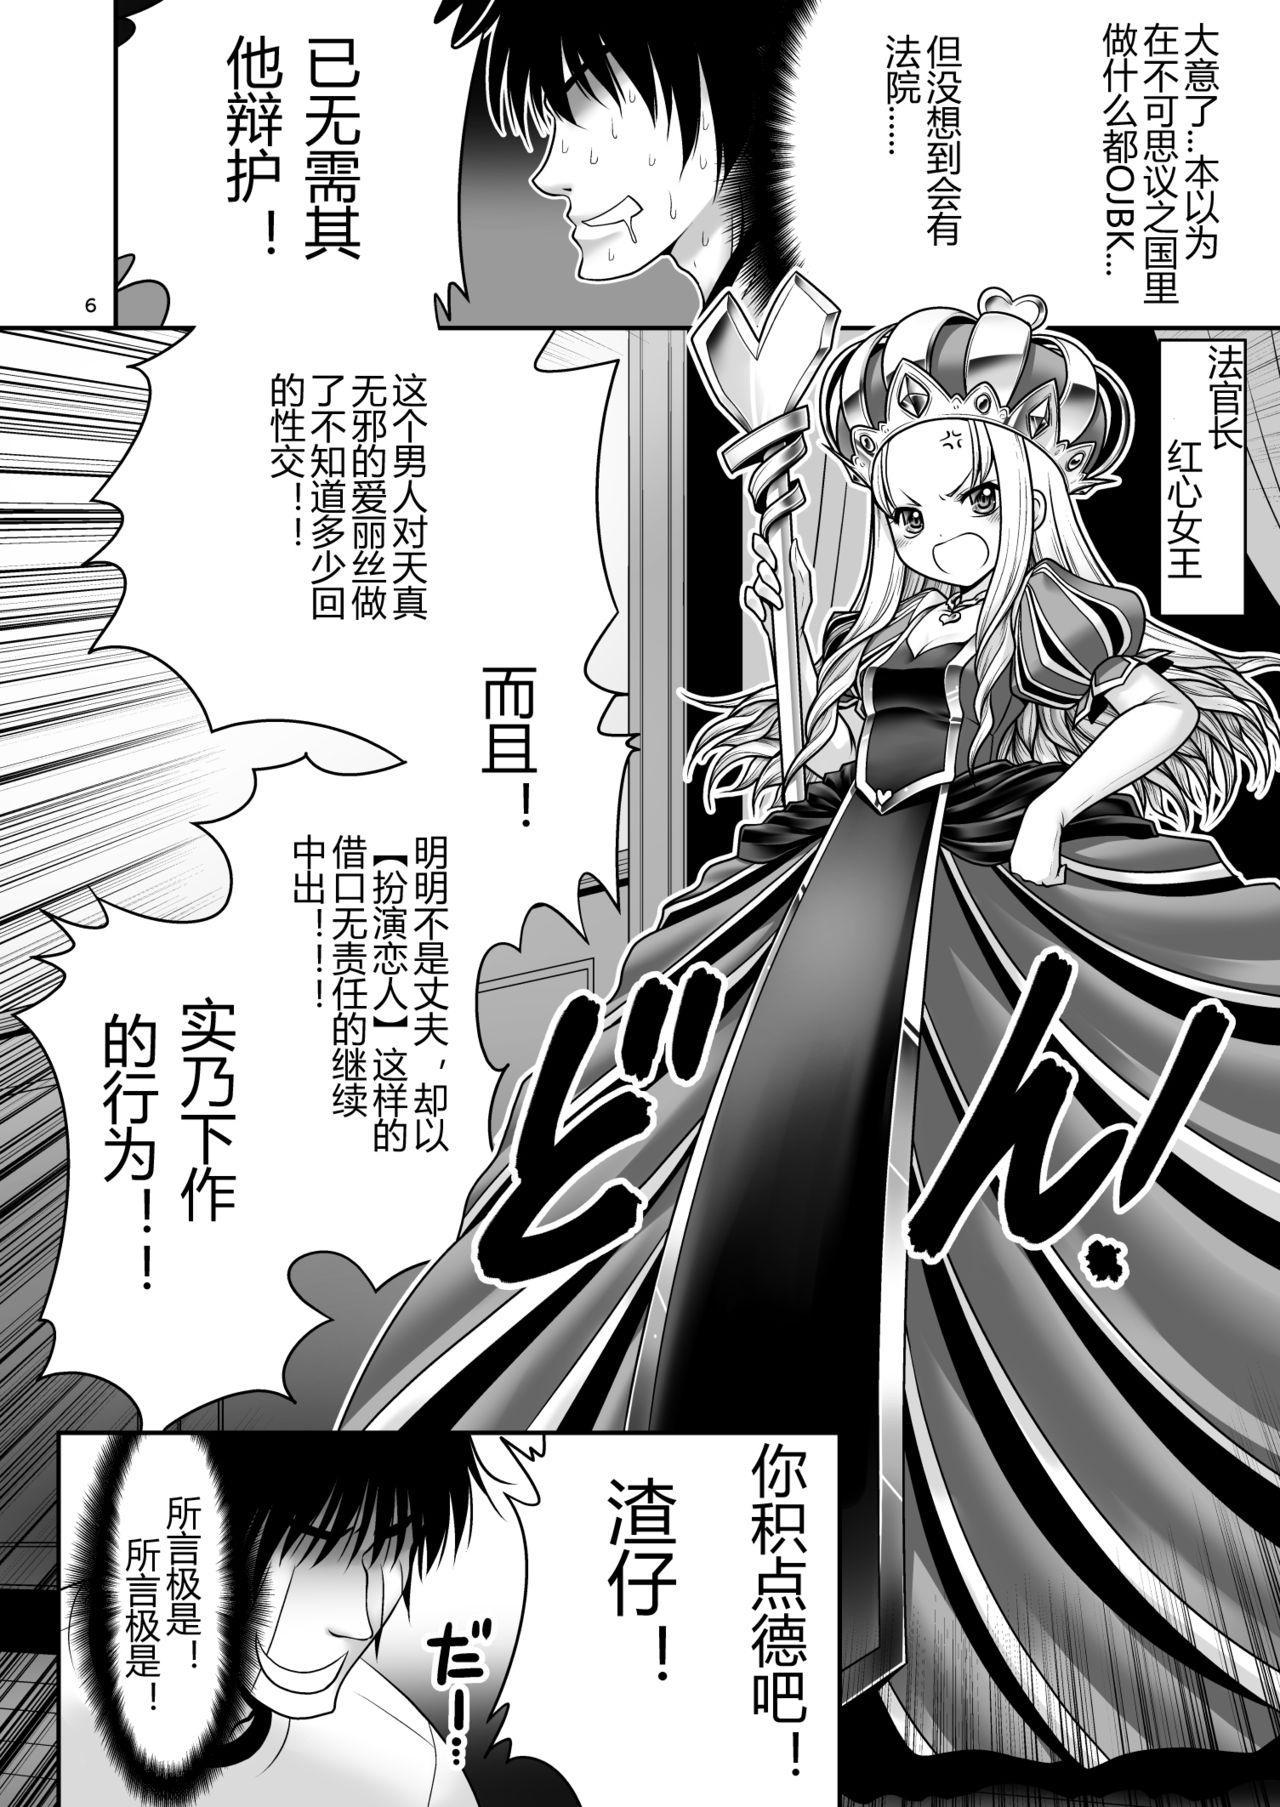 Heart no Joou to Alice Inkou Saiban ver 1.1 5